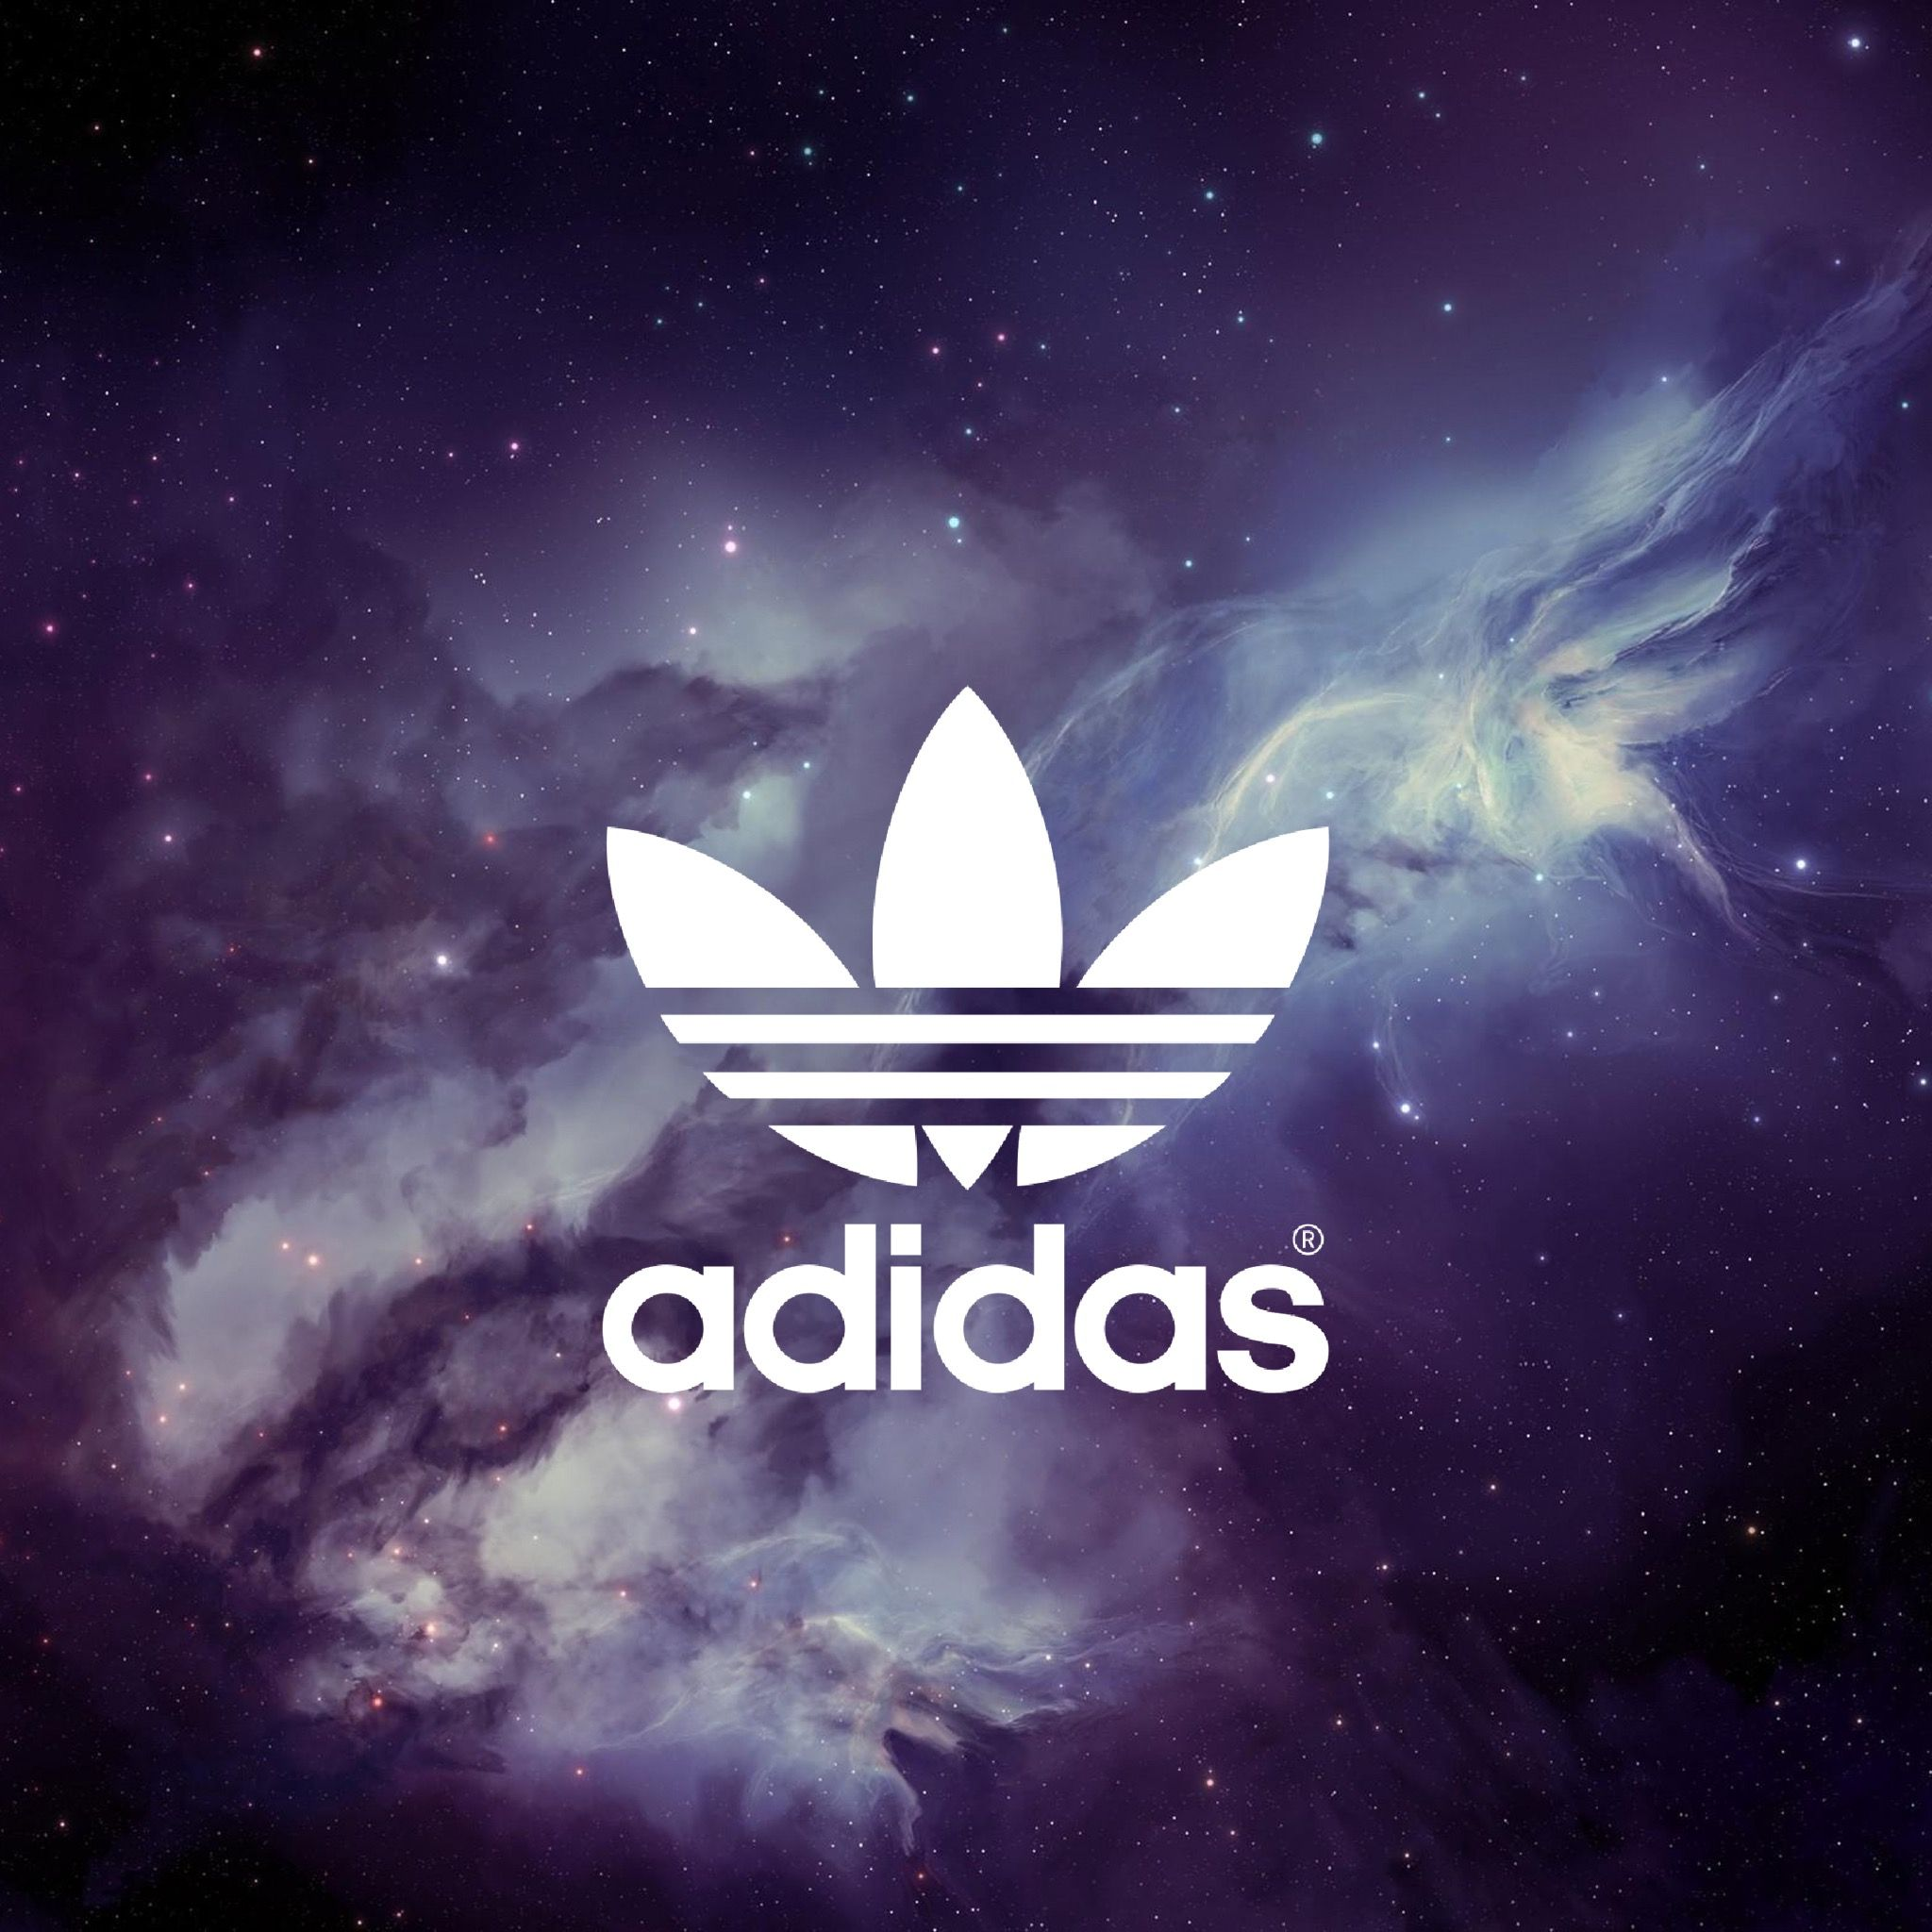 Adidas Galaxy Wallpapers   Top Adidas Galaxy Backgrounds 2048x2048